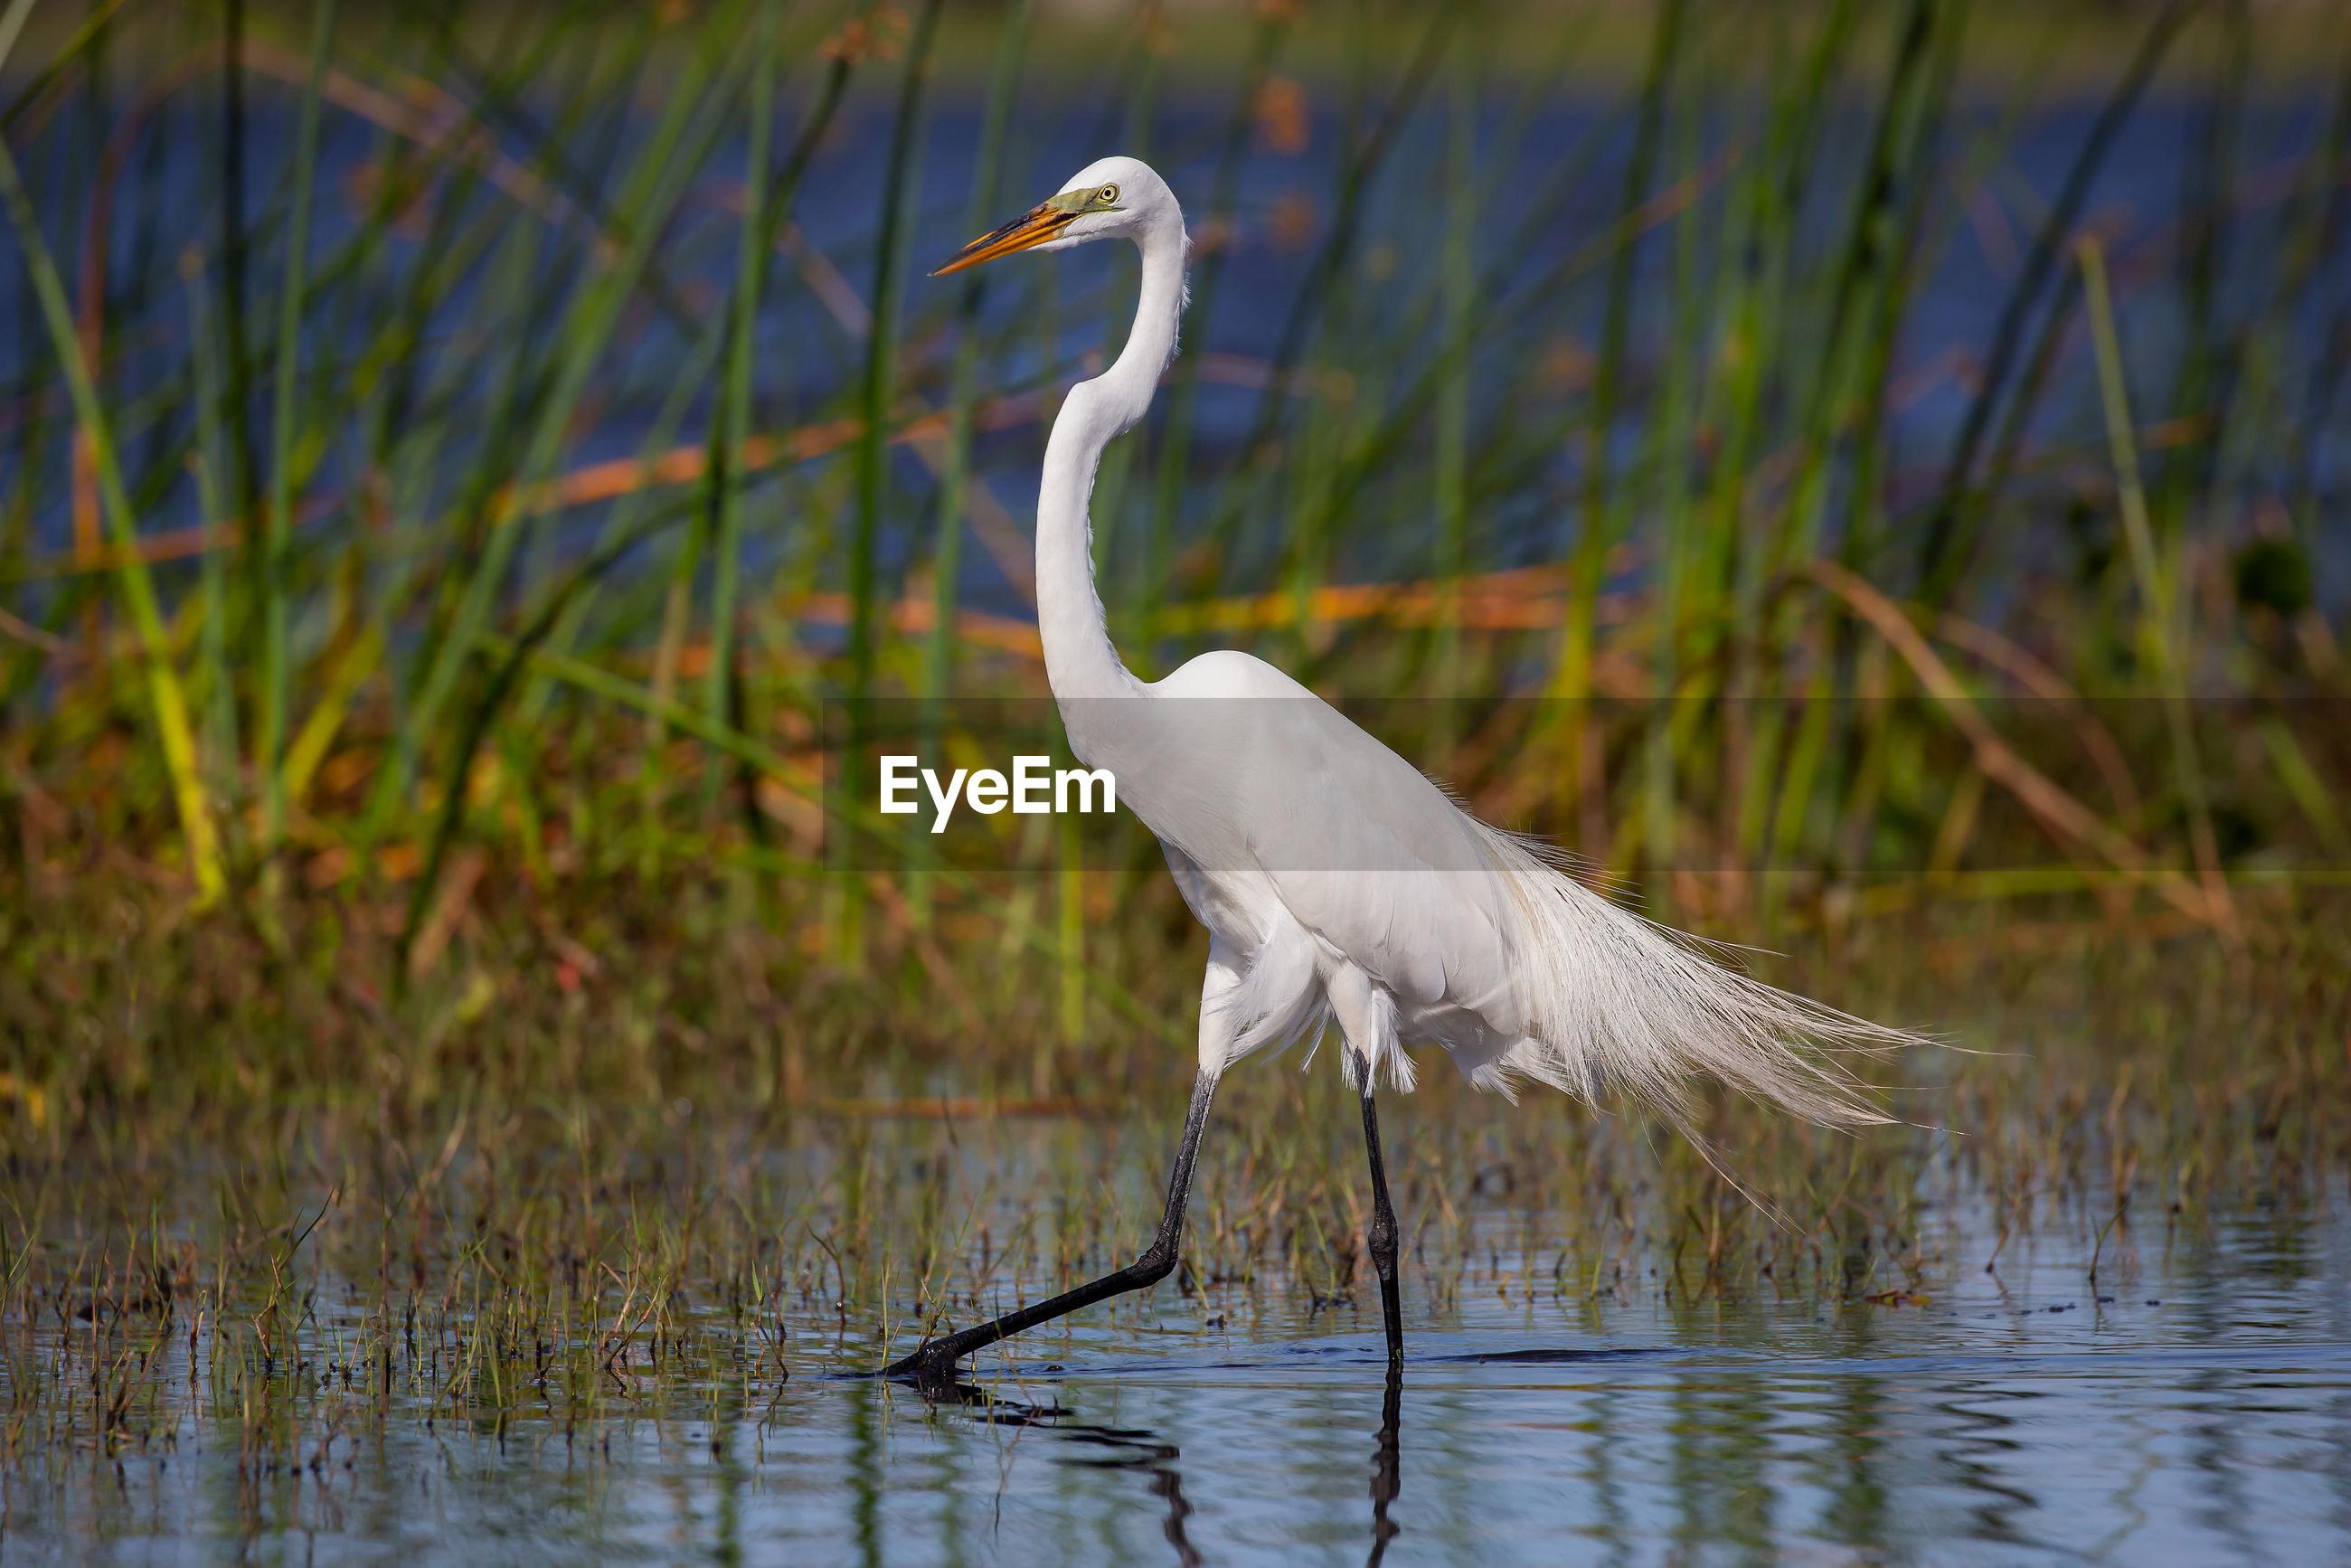 Bird by grass in lake